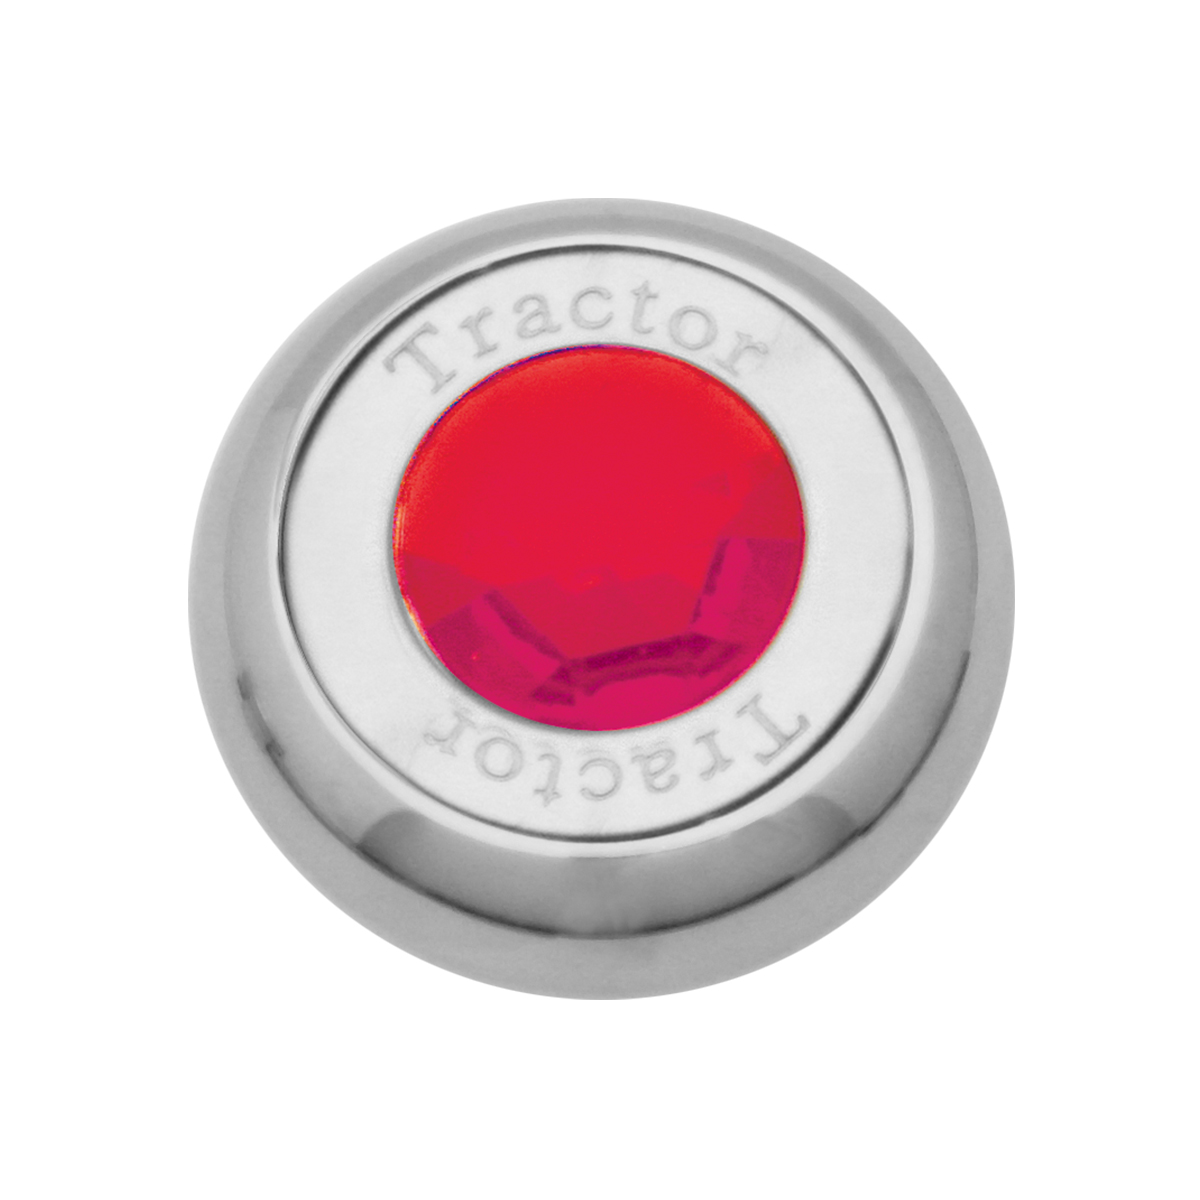 95375 Chrome Screw-In Air Valve Control Knob w/ Crystal